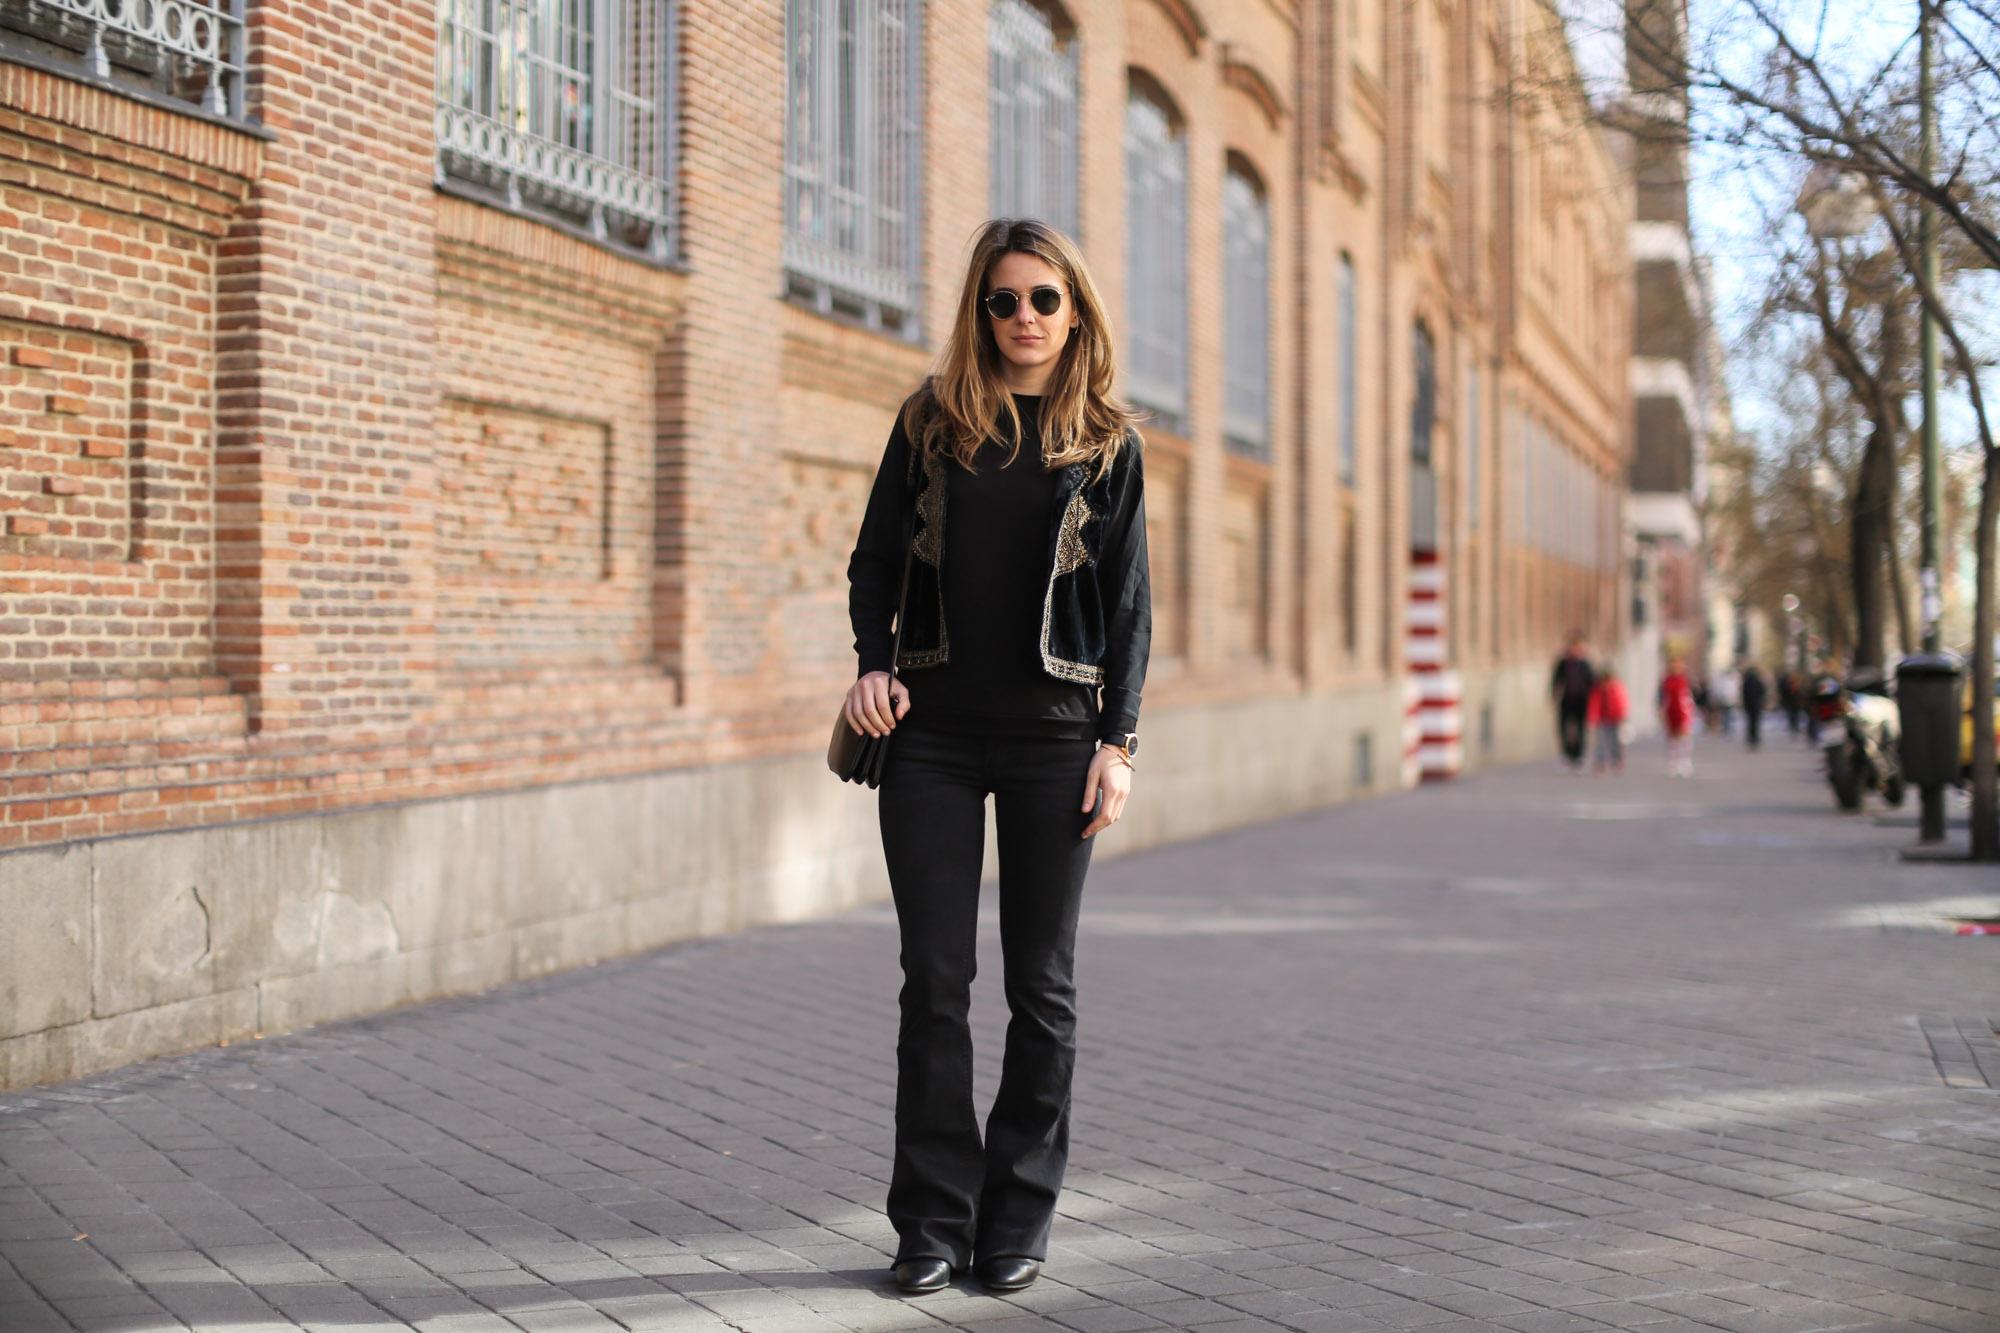 Clochet-streetstyle-zara-black-flared-jeans-boho-vest-larssonandjennins-saxon-17